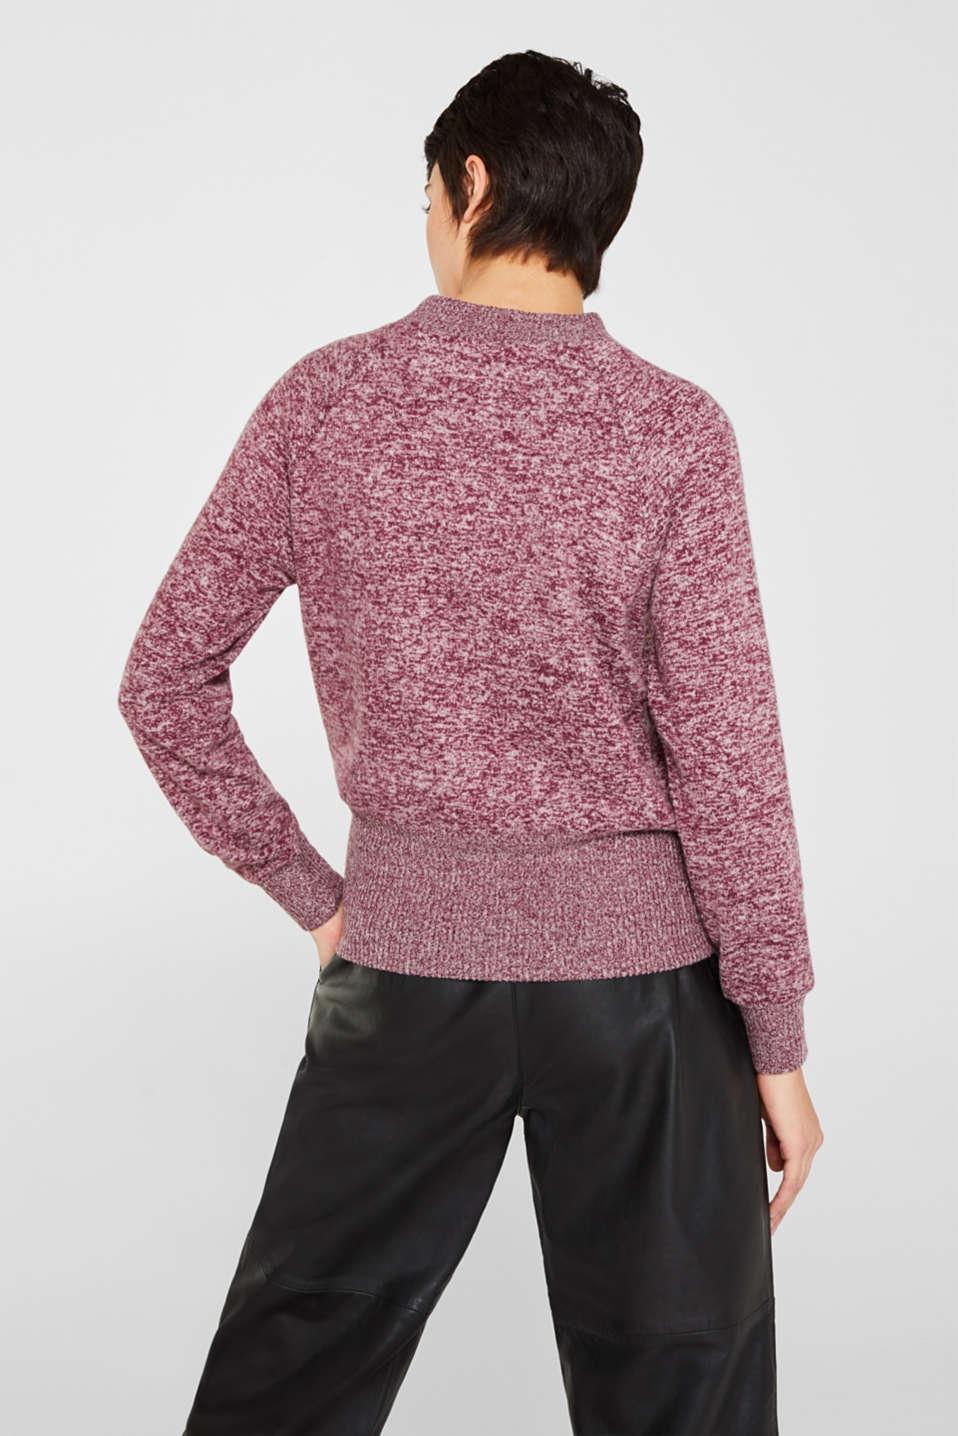 Fluffy sweatshirt in a melange finish, BORDEAUX RED 5, detail image number 3